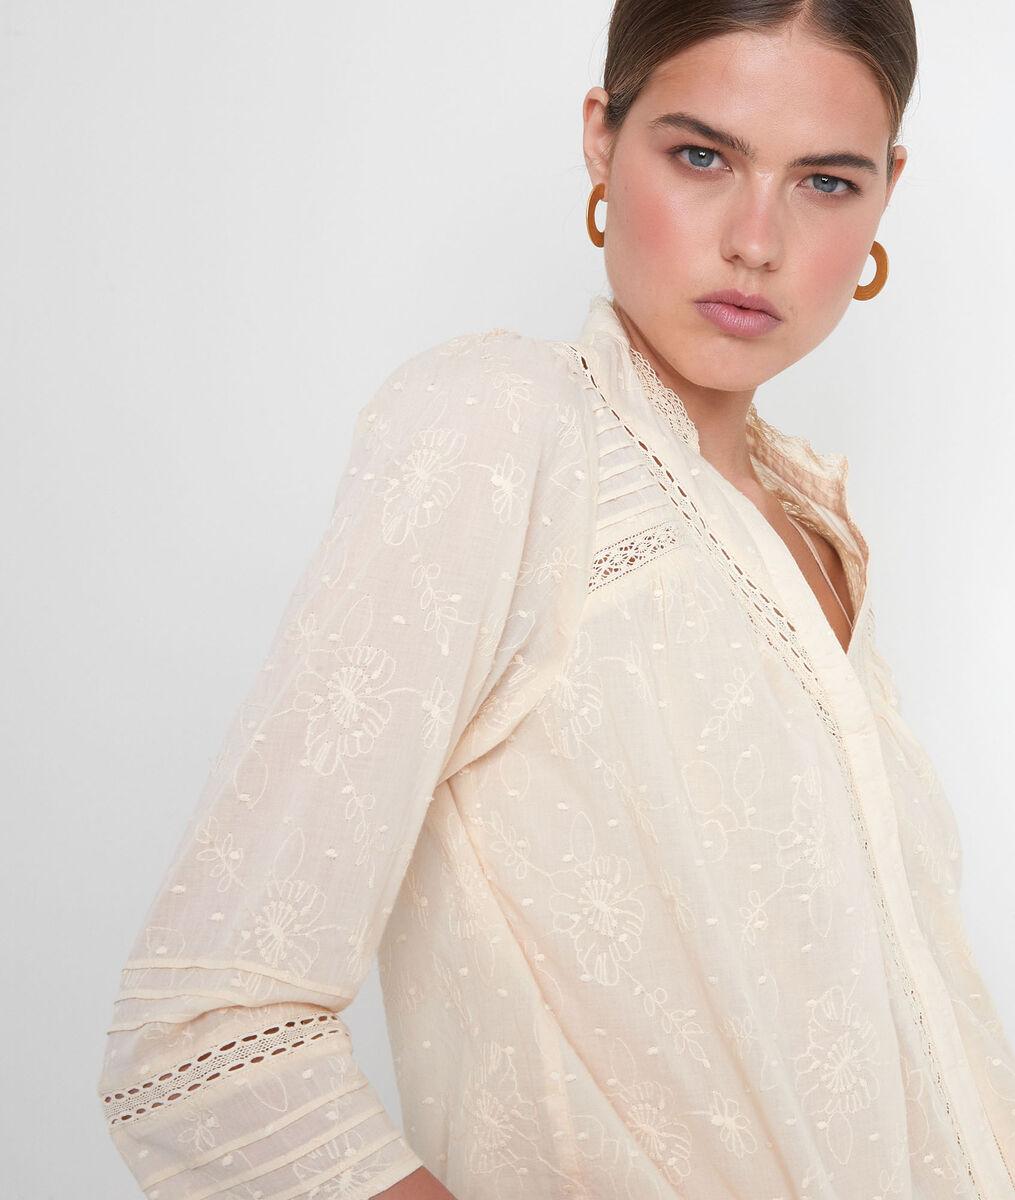 Strogele katoenen blouse met borduurwerk Aicha PhotoZ | 1-2-3